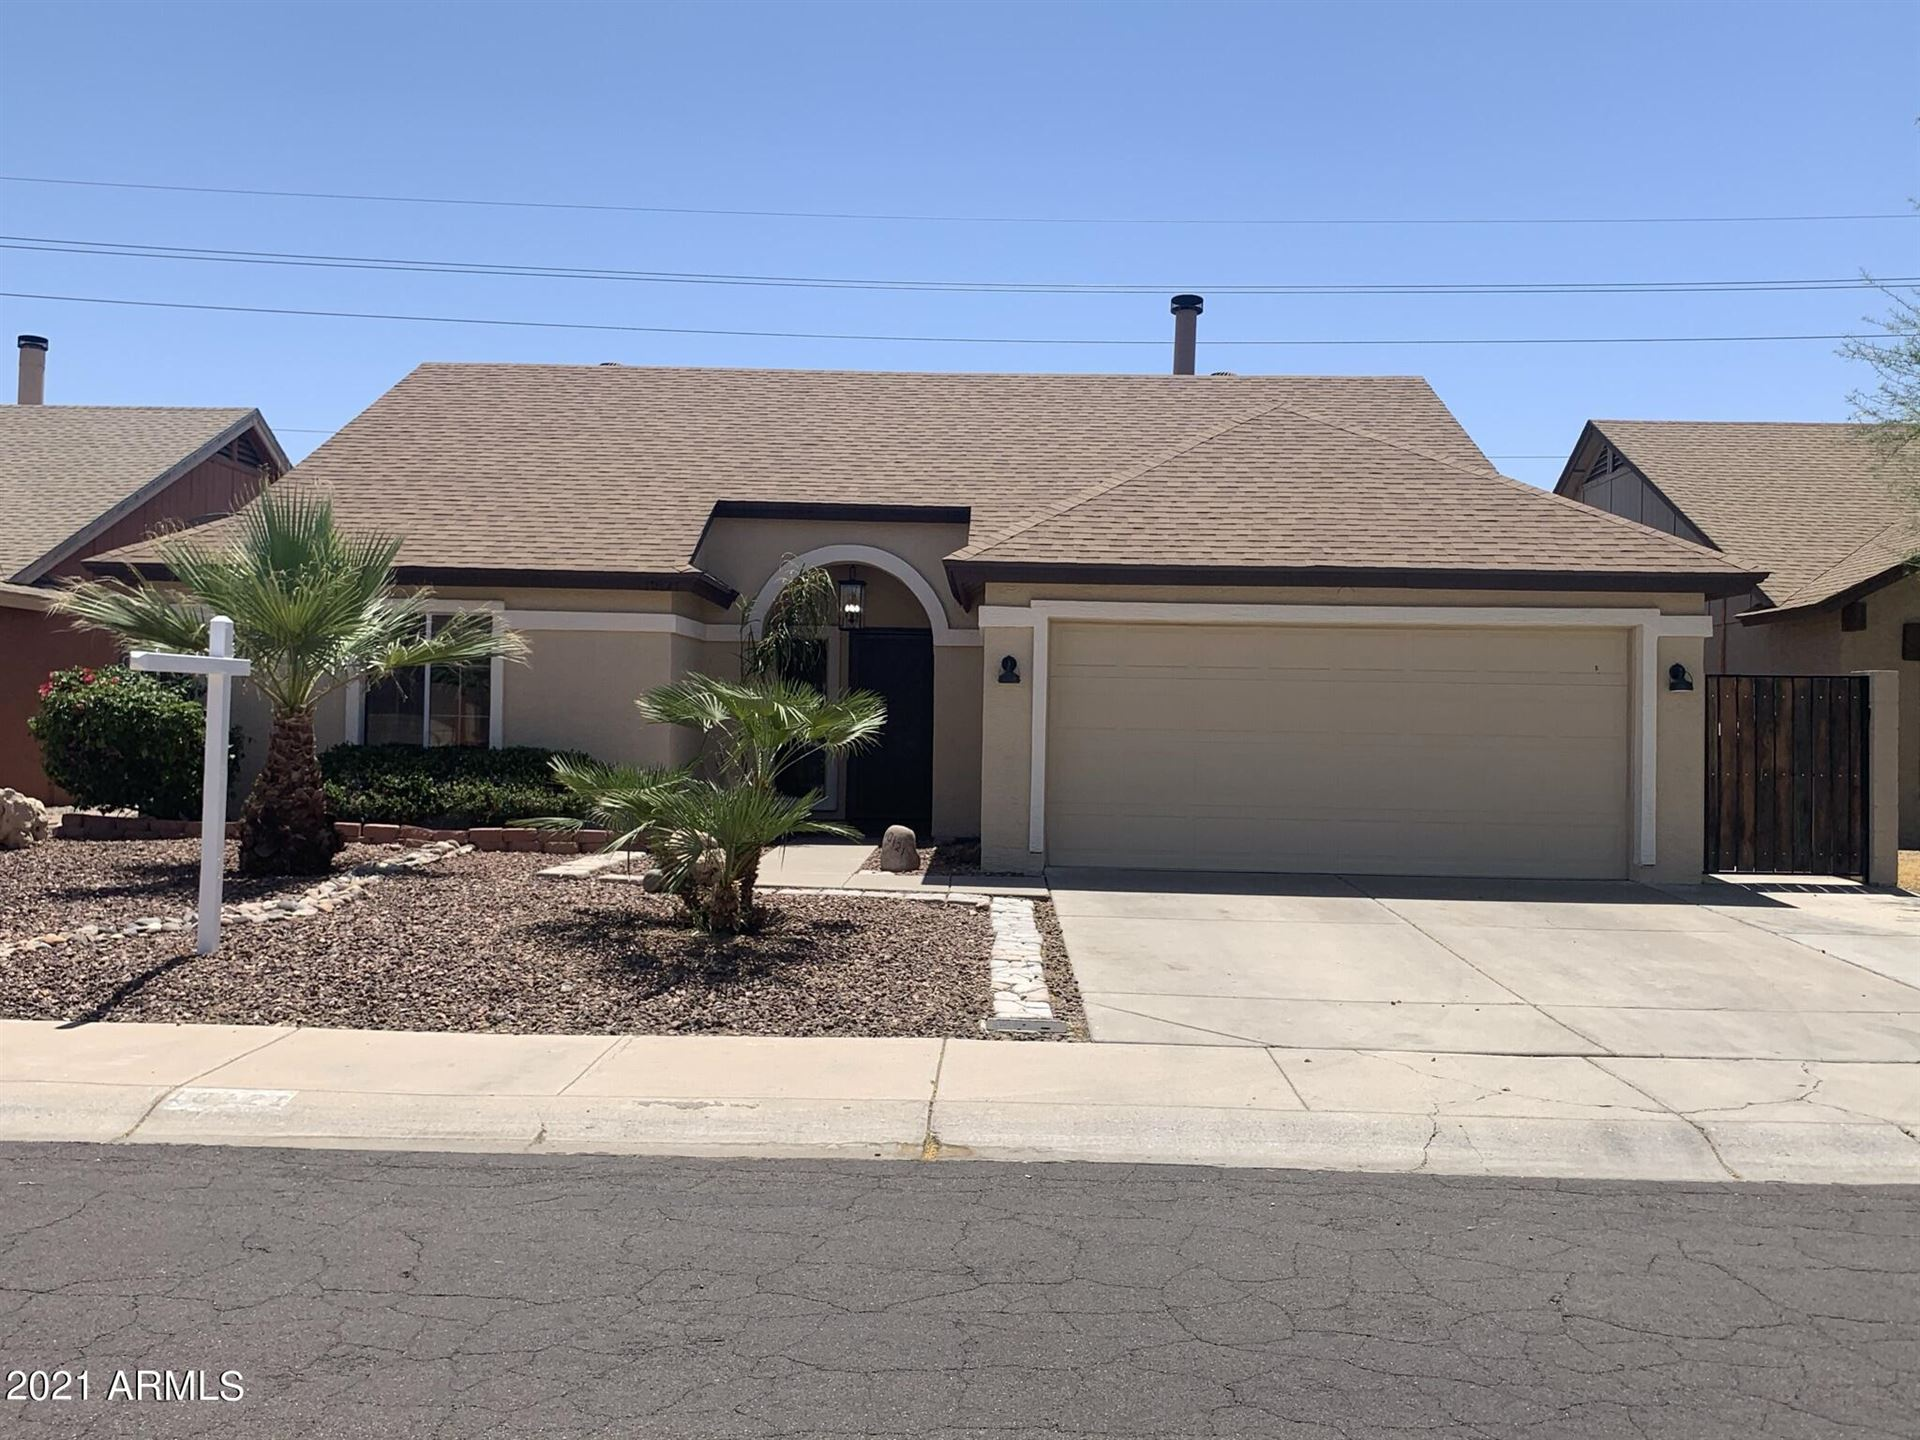 Photo of 10121 W PASADENA Avenue, Glendale, AZ 85307 (MLS # 6234510)